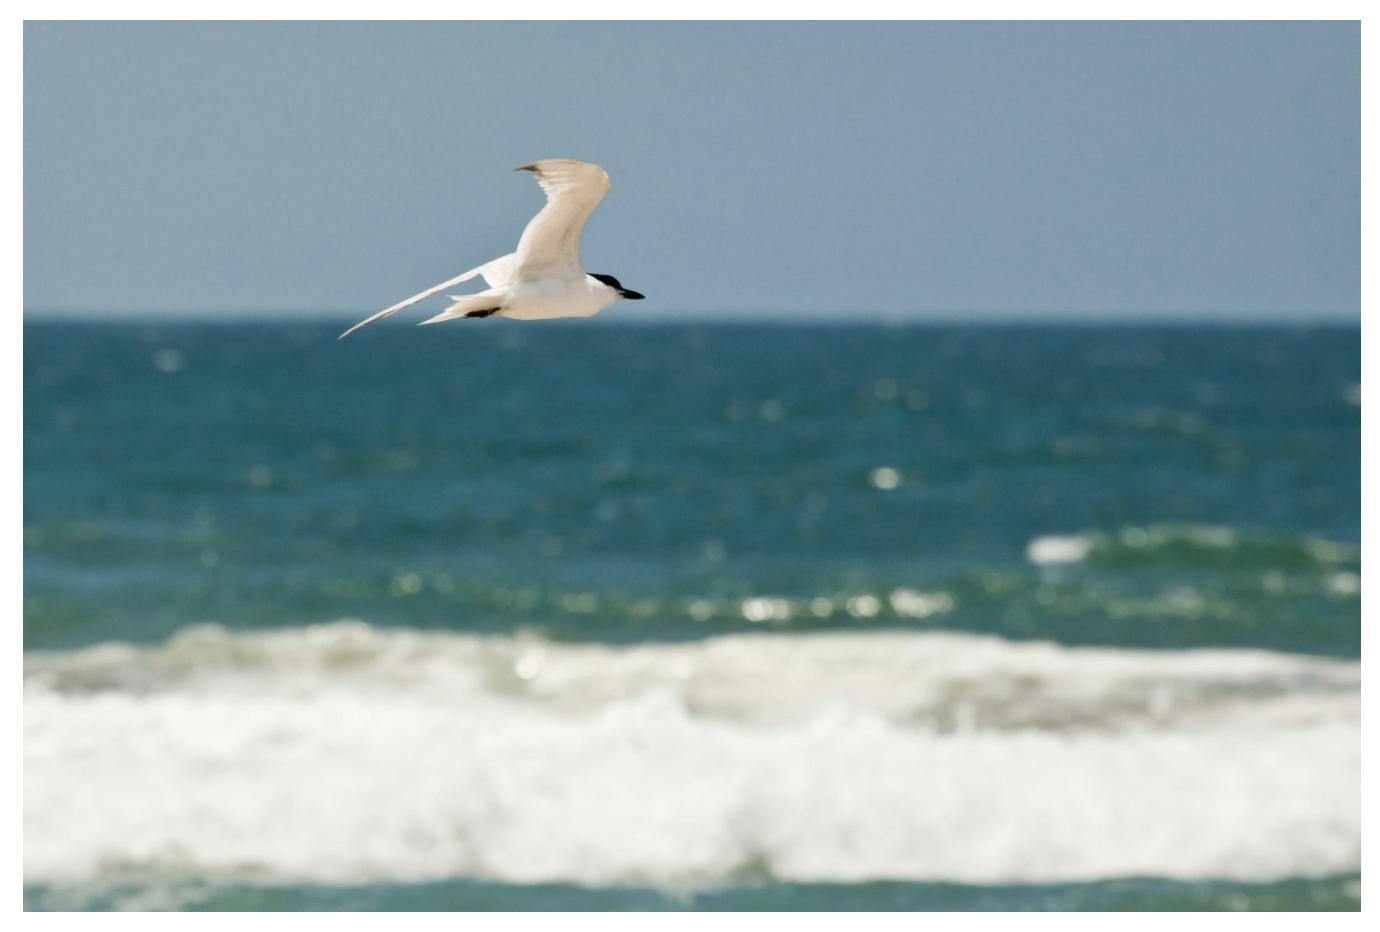 Gull-billed Tern. Photo: Photo: USFWS/Flickr (CC BY 2.0).